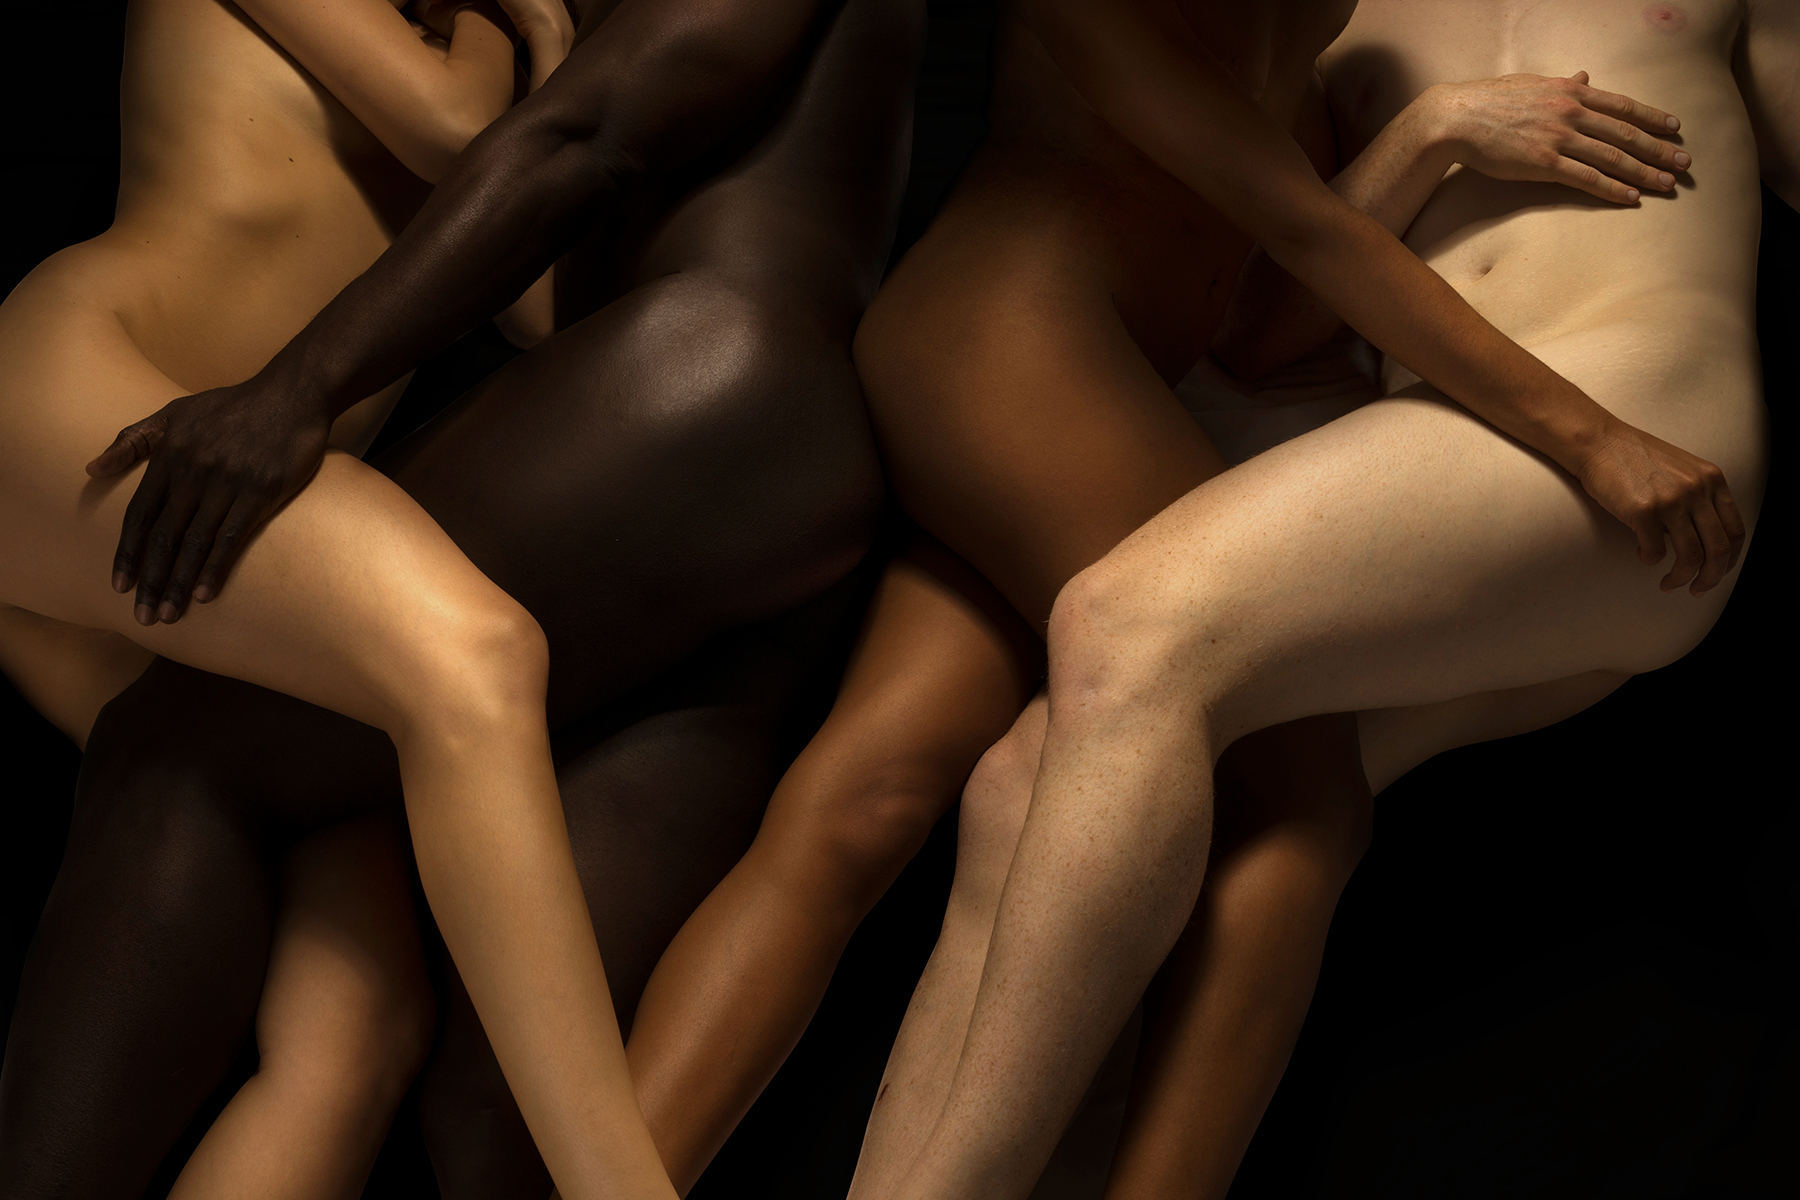 Attenya Porn Videos Pornhuv racism in porn industry under scrutiny amid nationwide